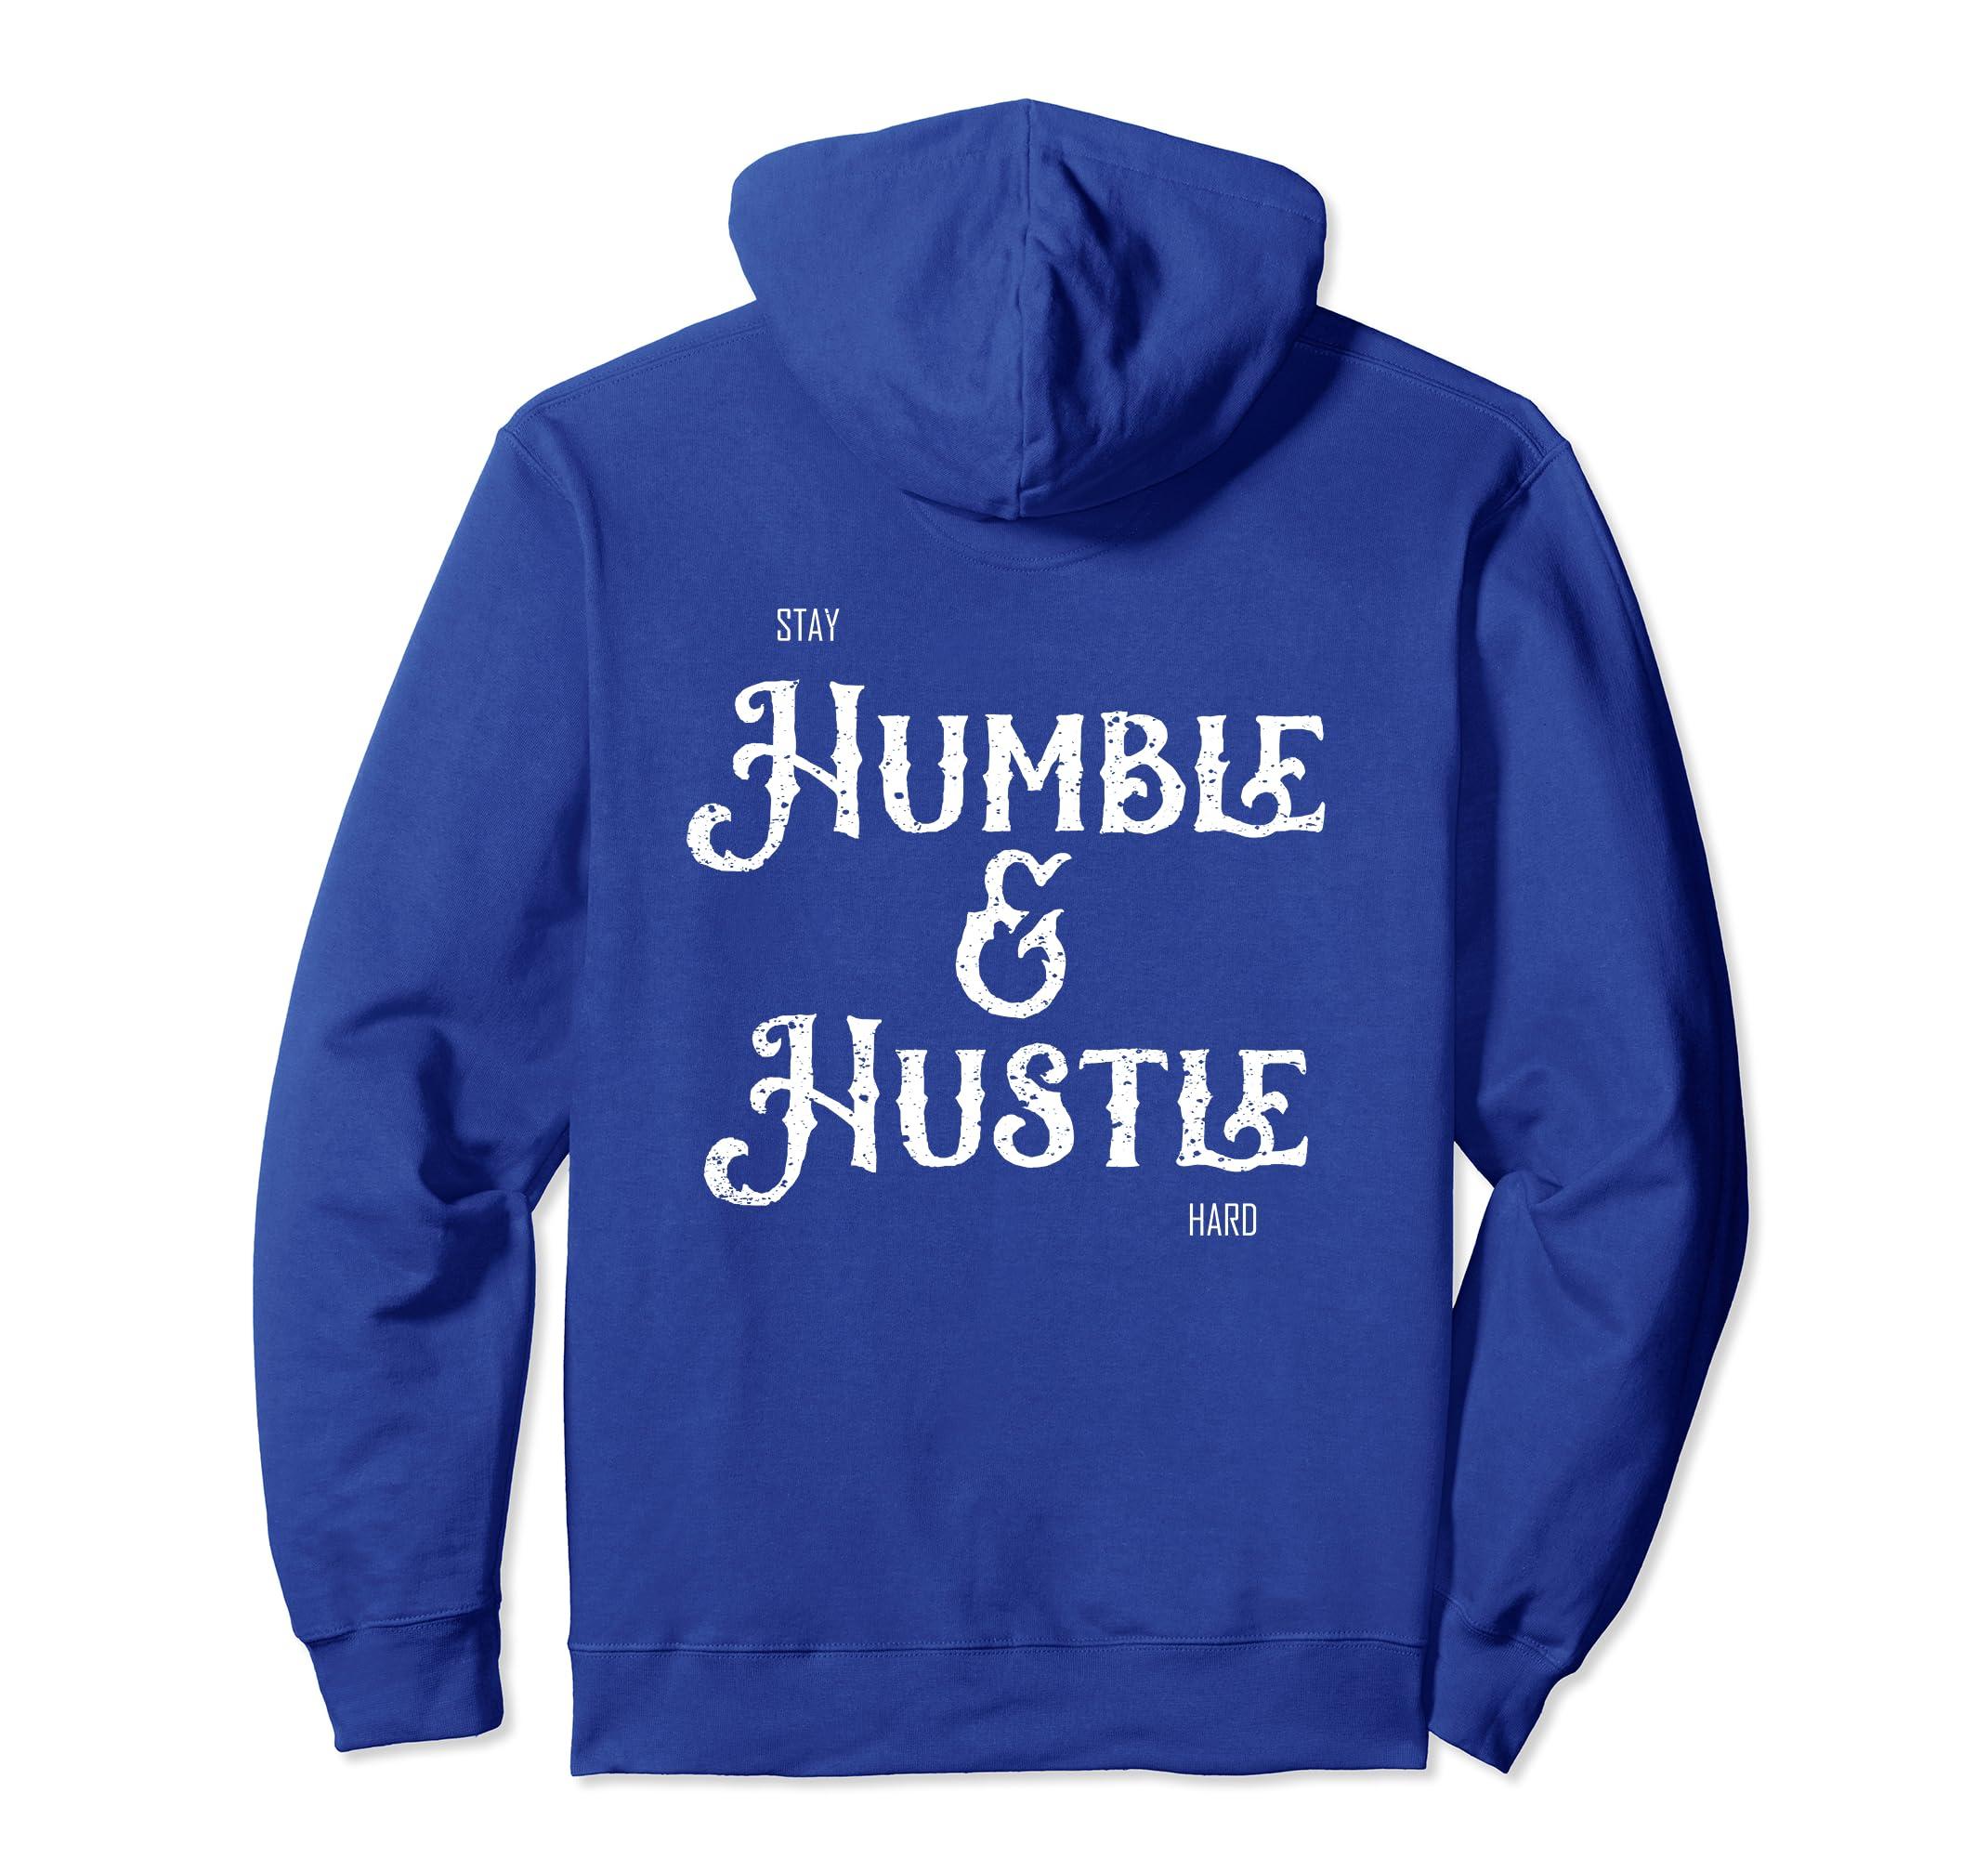 cd6562e0a Amazon.com: Stay Humble & Hustle Hard Distressed Text BACK PRINT Hoodie:  Clothing